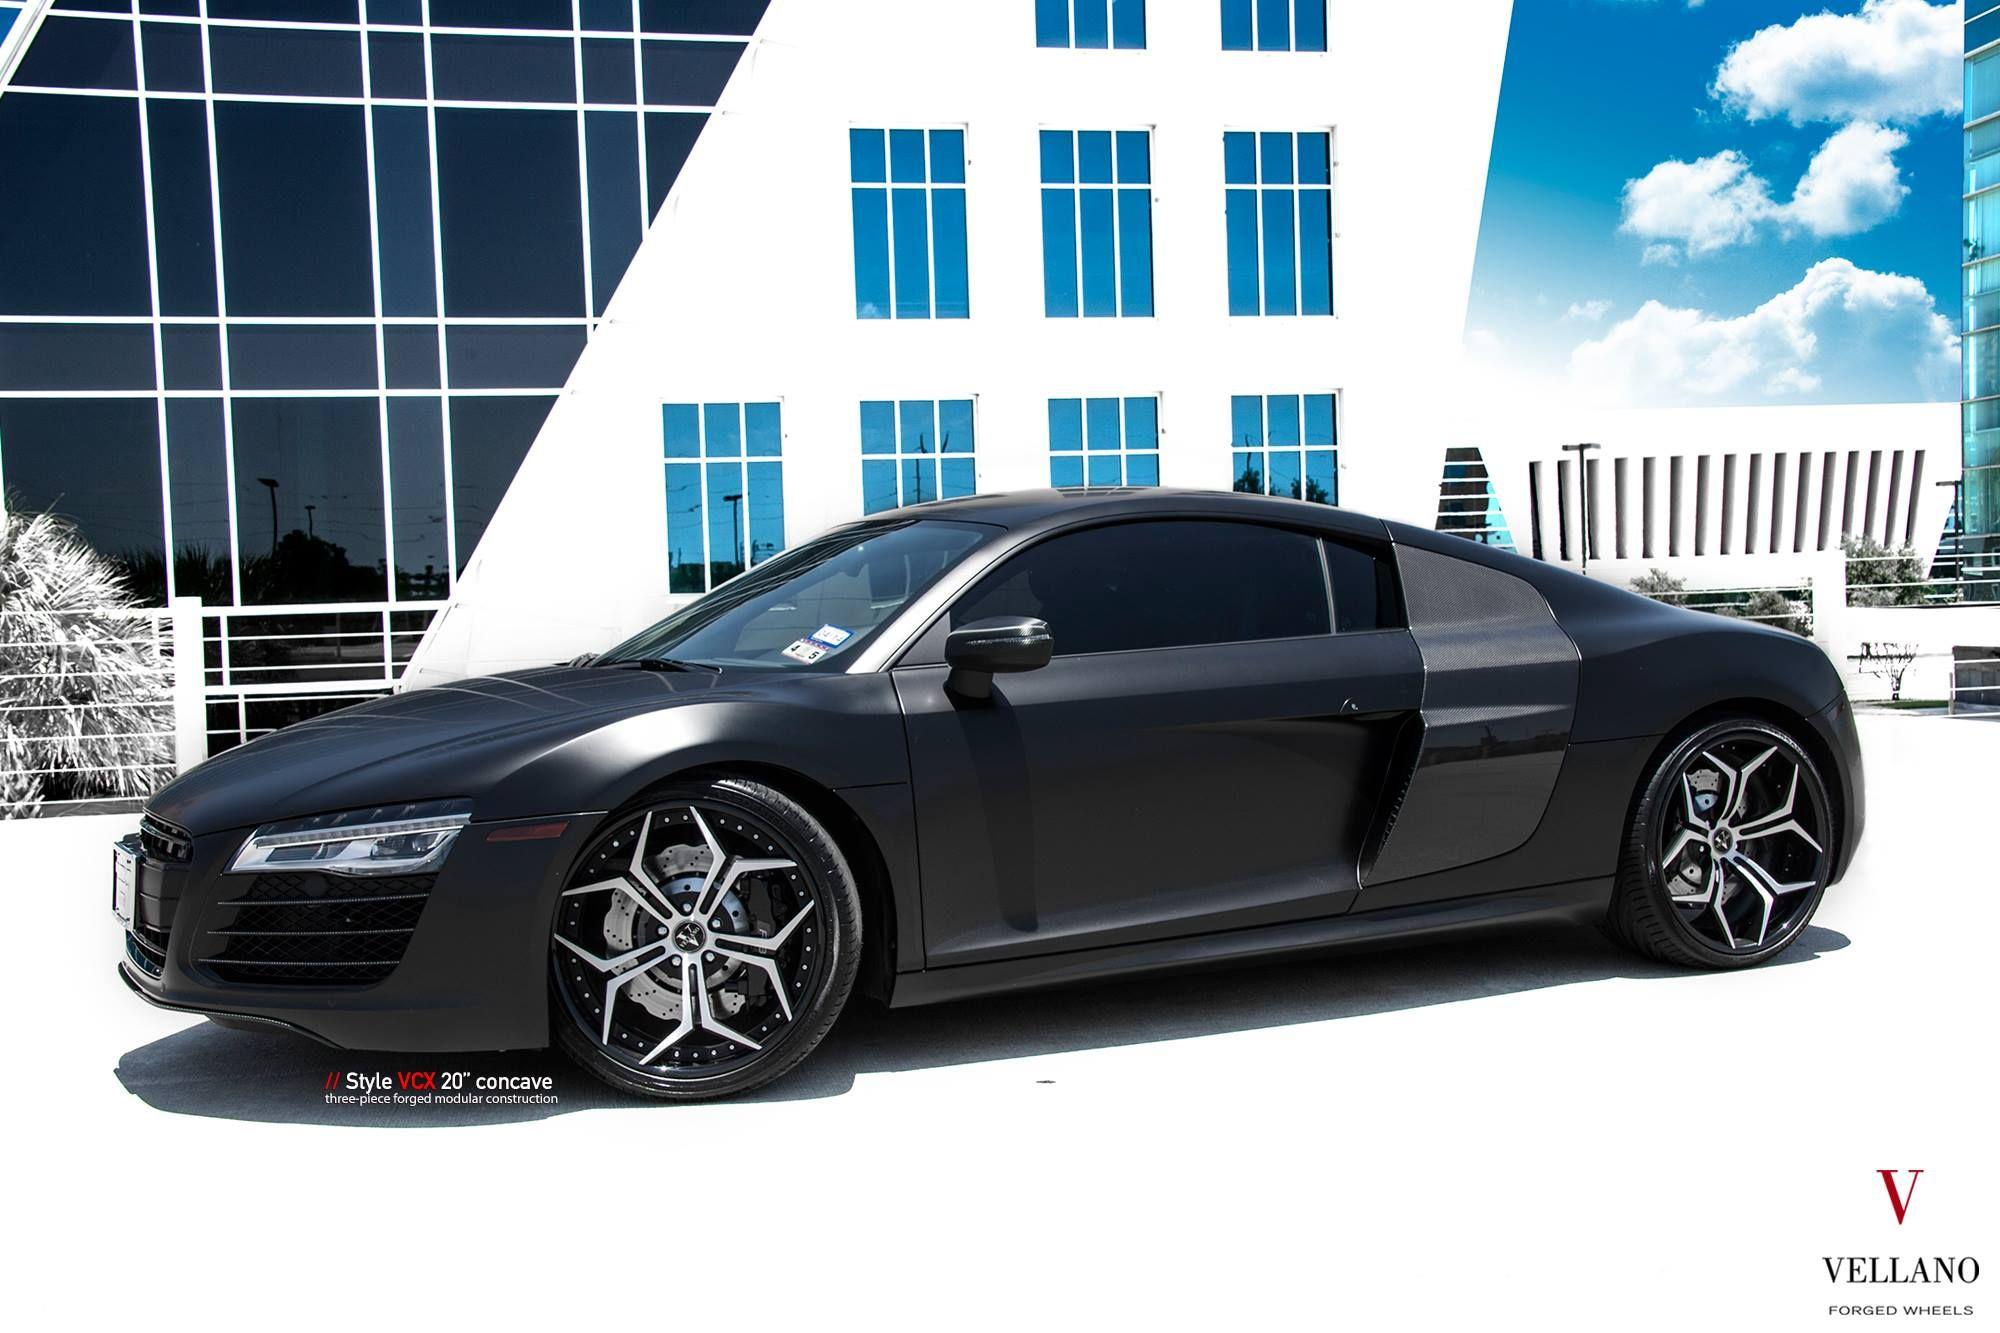 Audi r8 v10 plus on vellano forged wheels https www carid